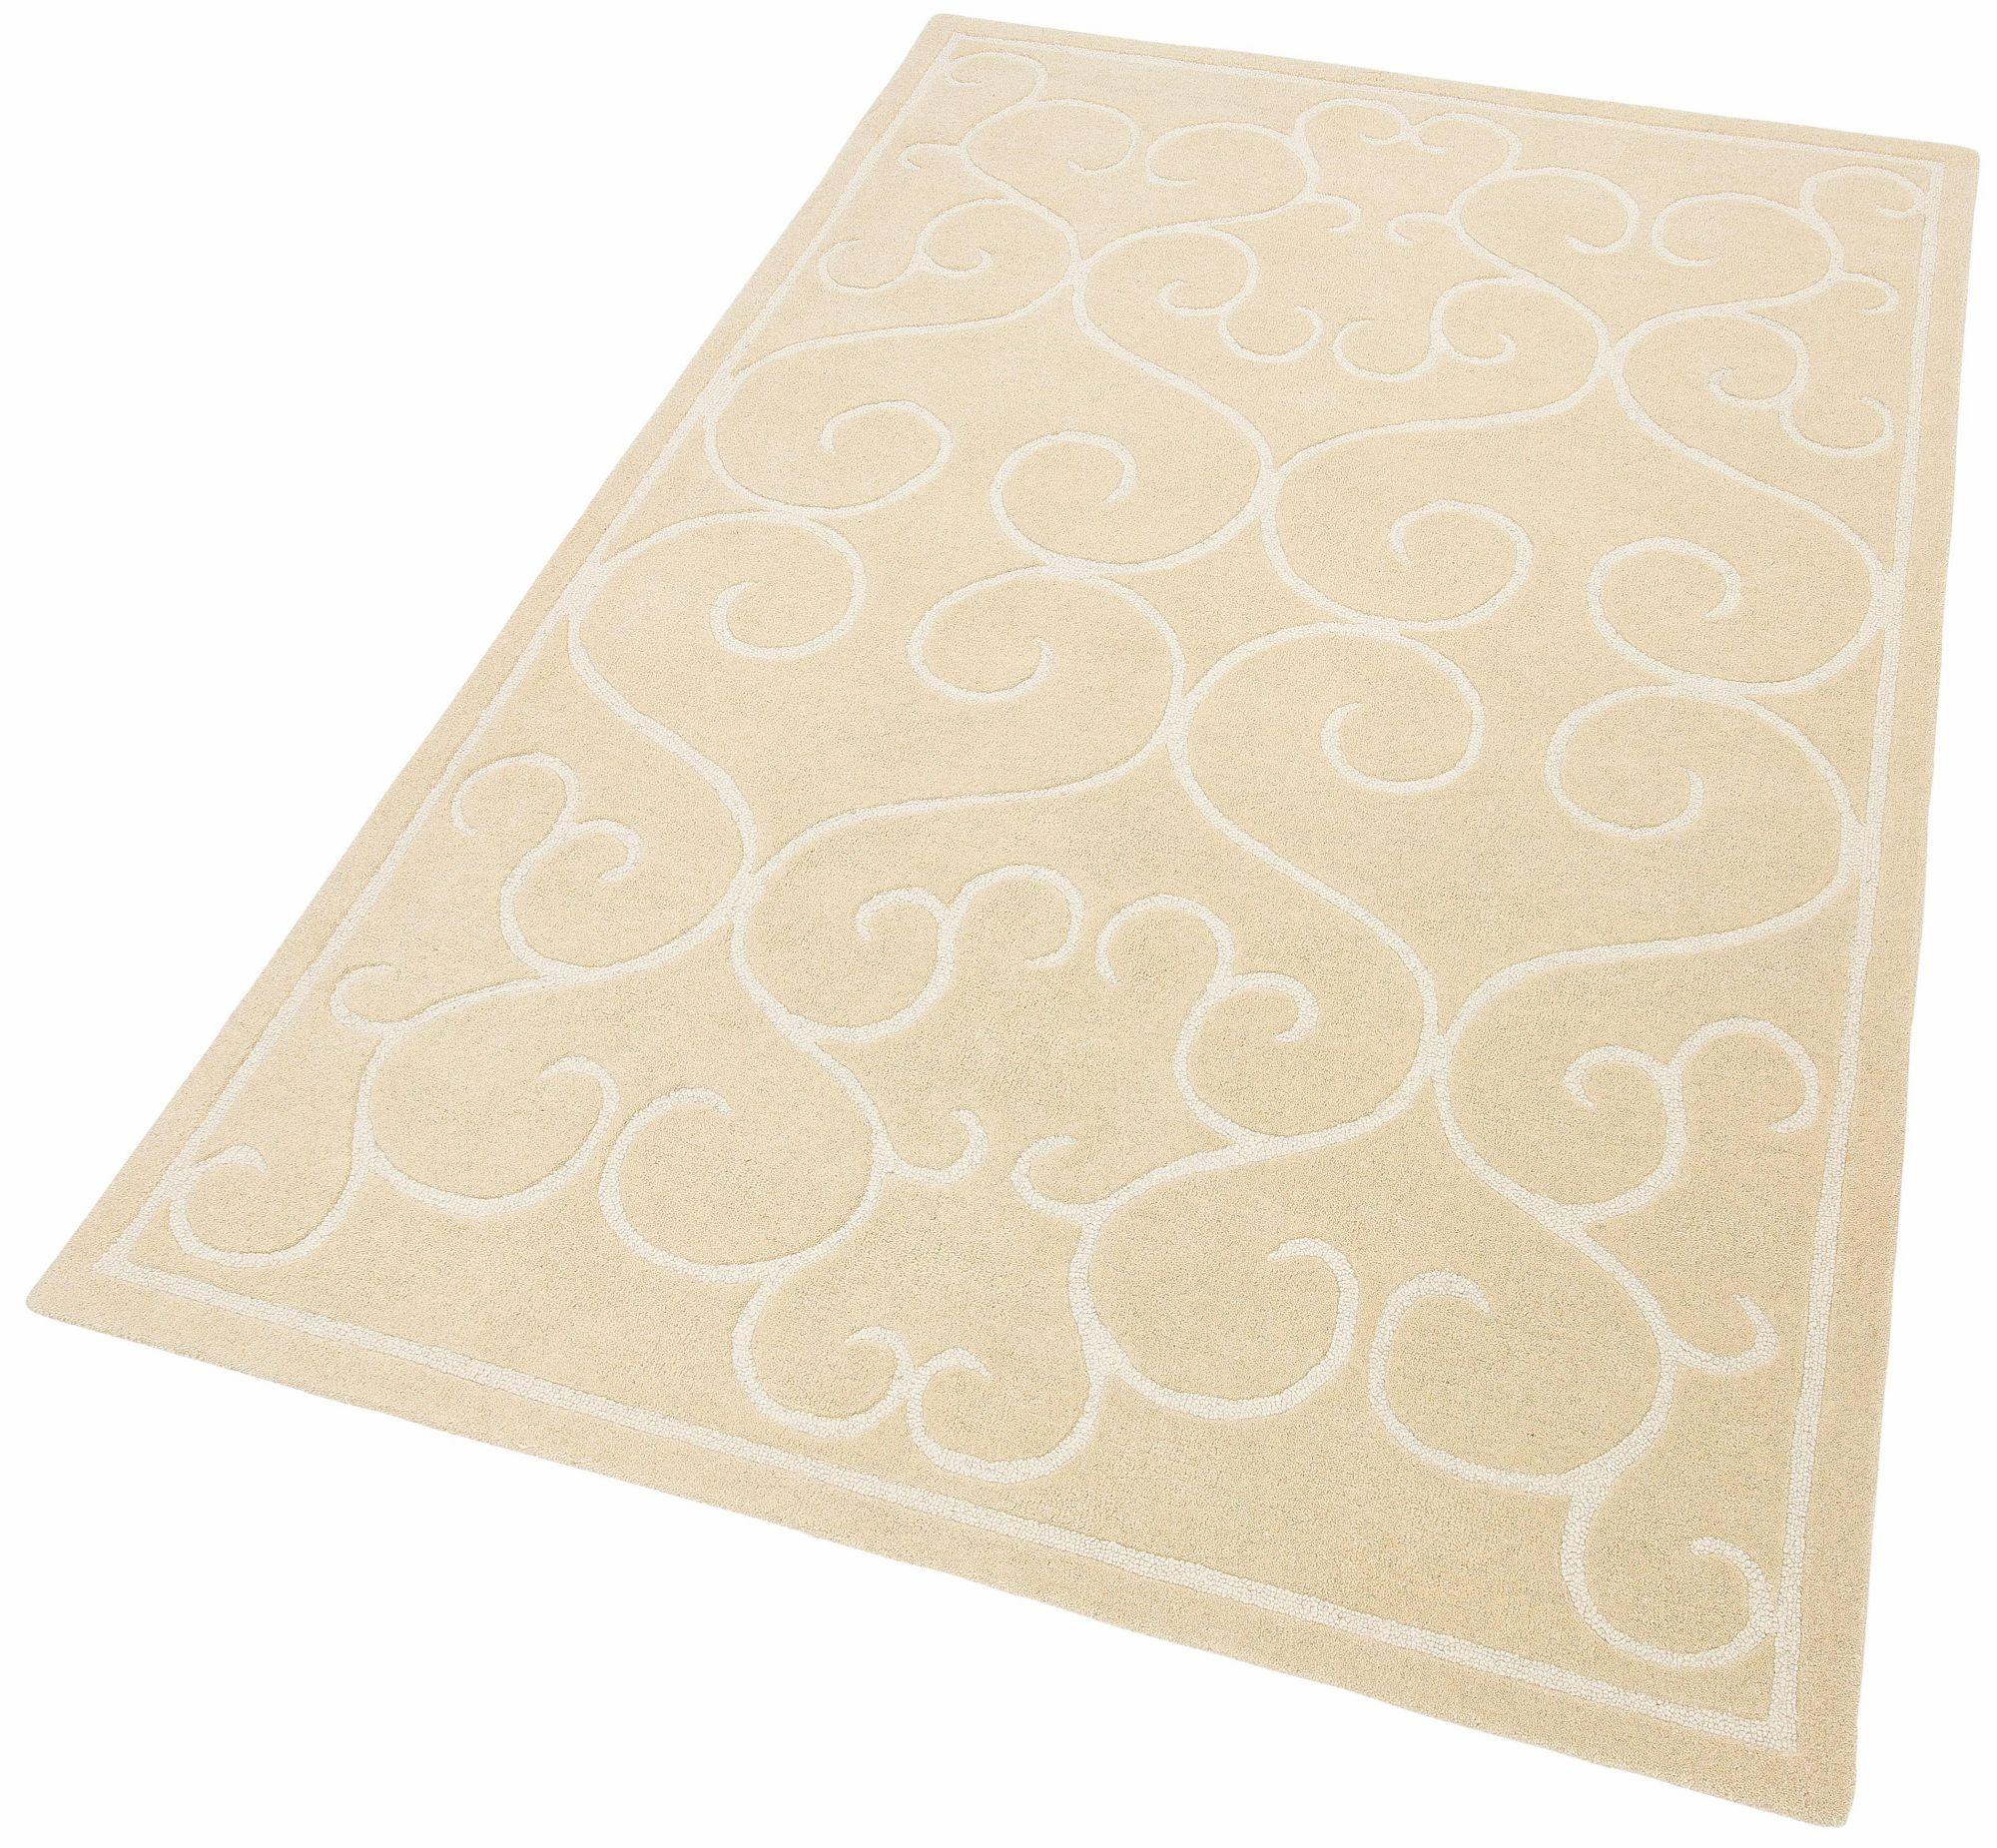 HOME AFFAIRE COLLECTION Teppich, Home affaire Collection, »Karla«, handgetuftet